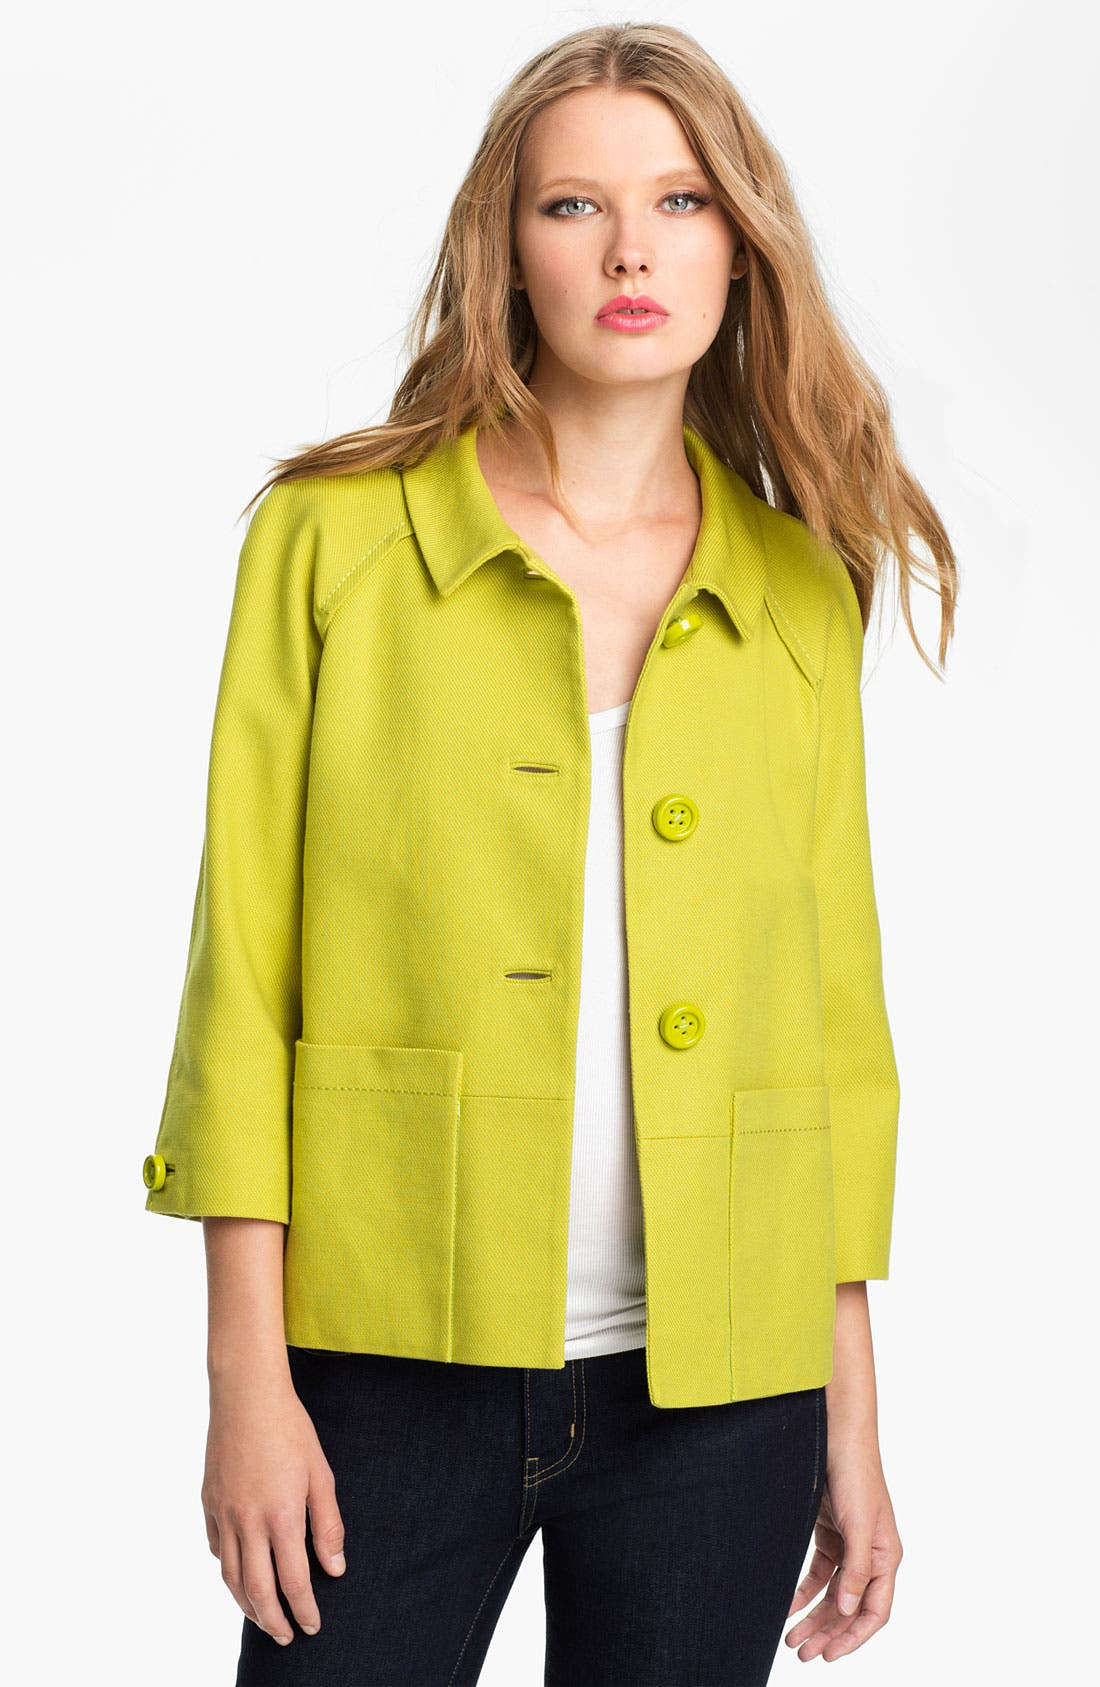 Alternate Image 1 Selected - kate spade new york 'suze' jacket